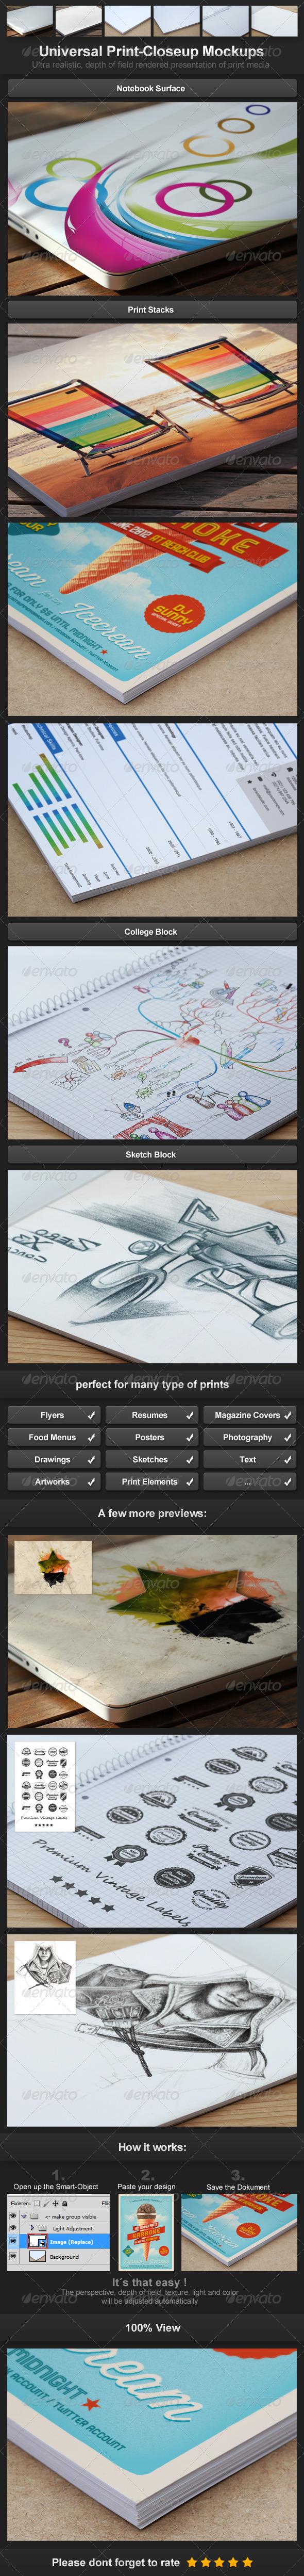 Universal Print-Closeup Mockups - Miscellaneous Print